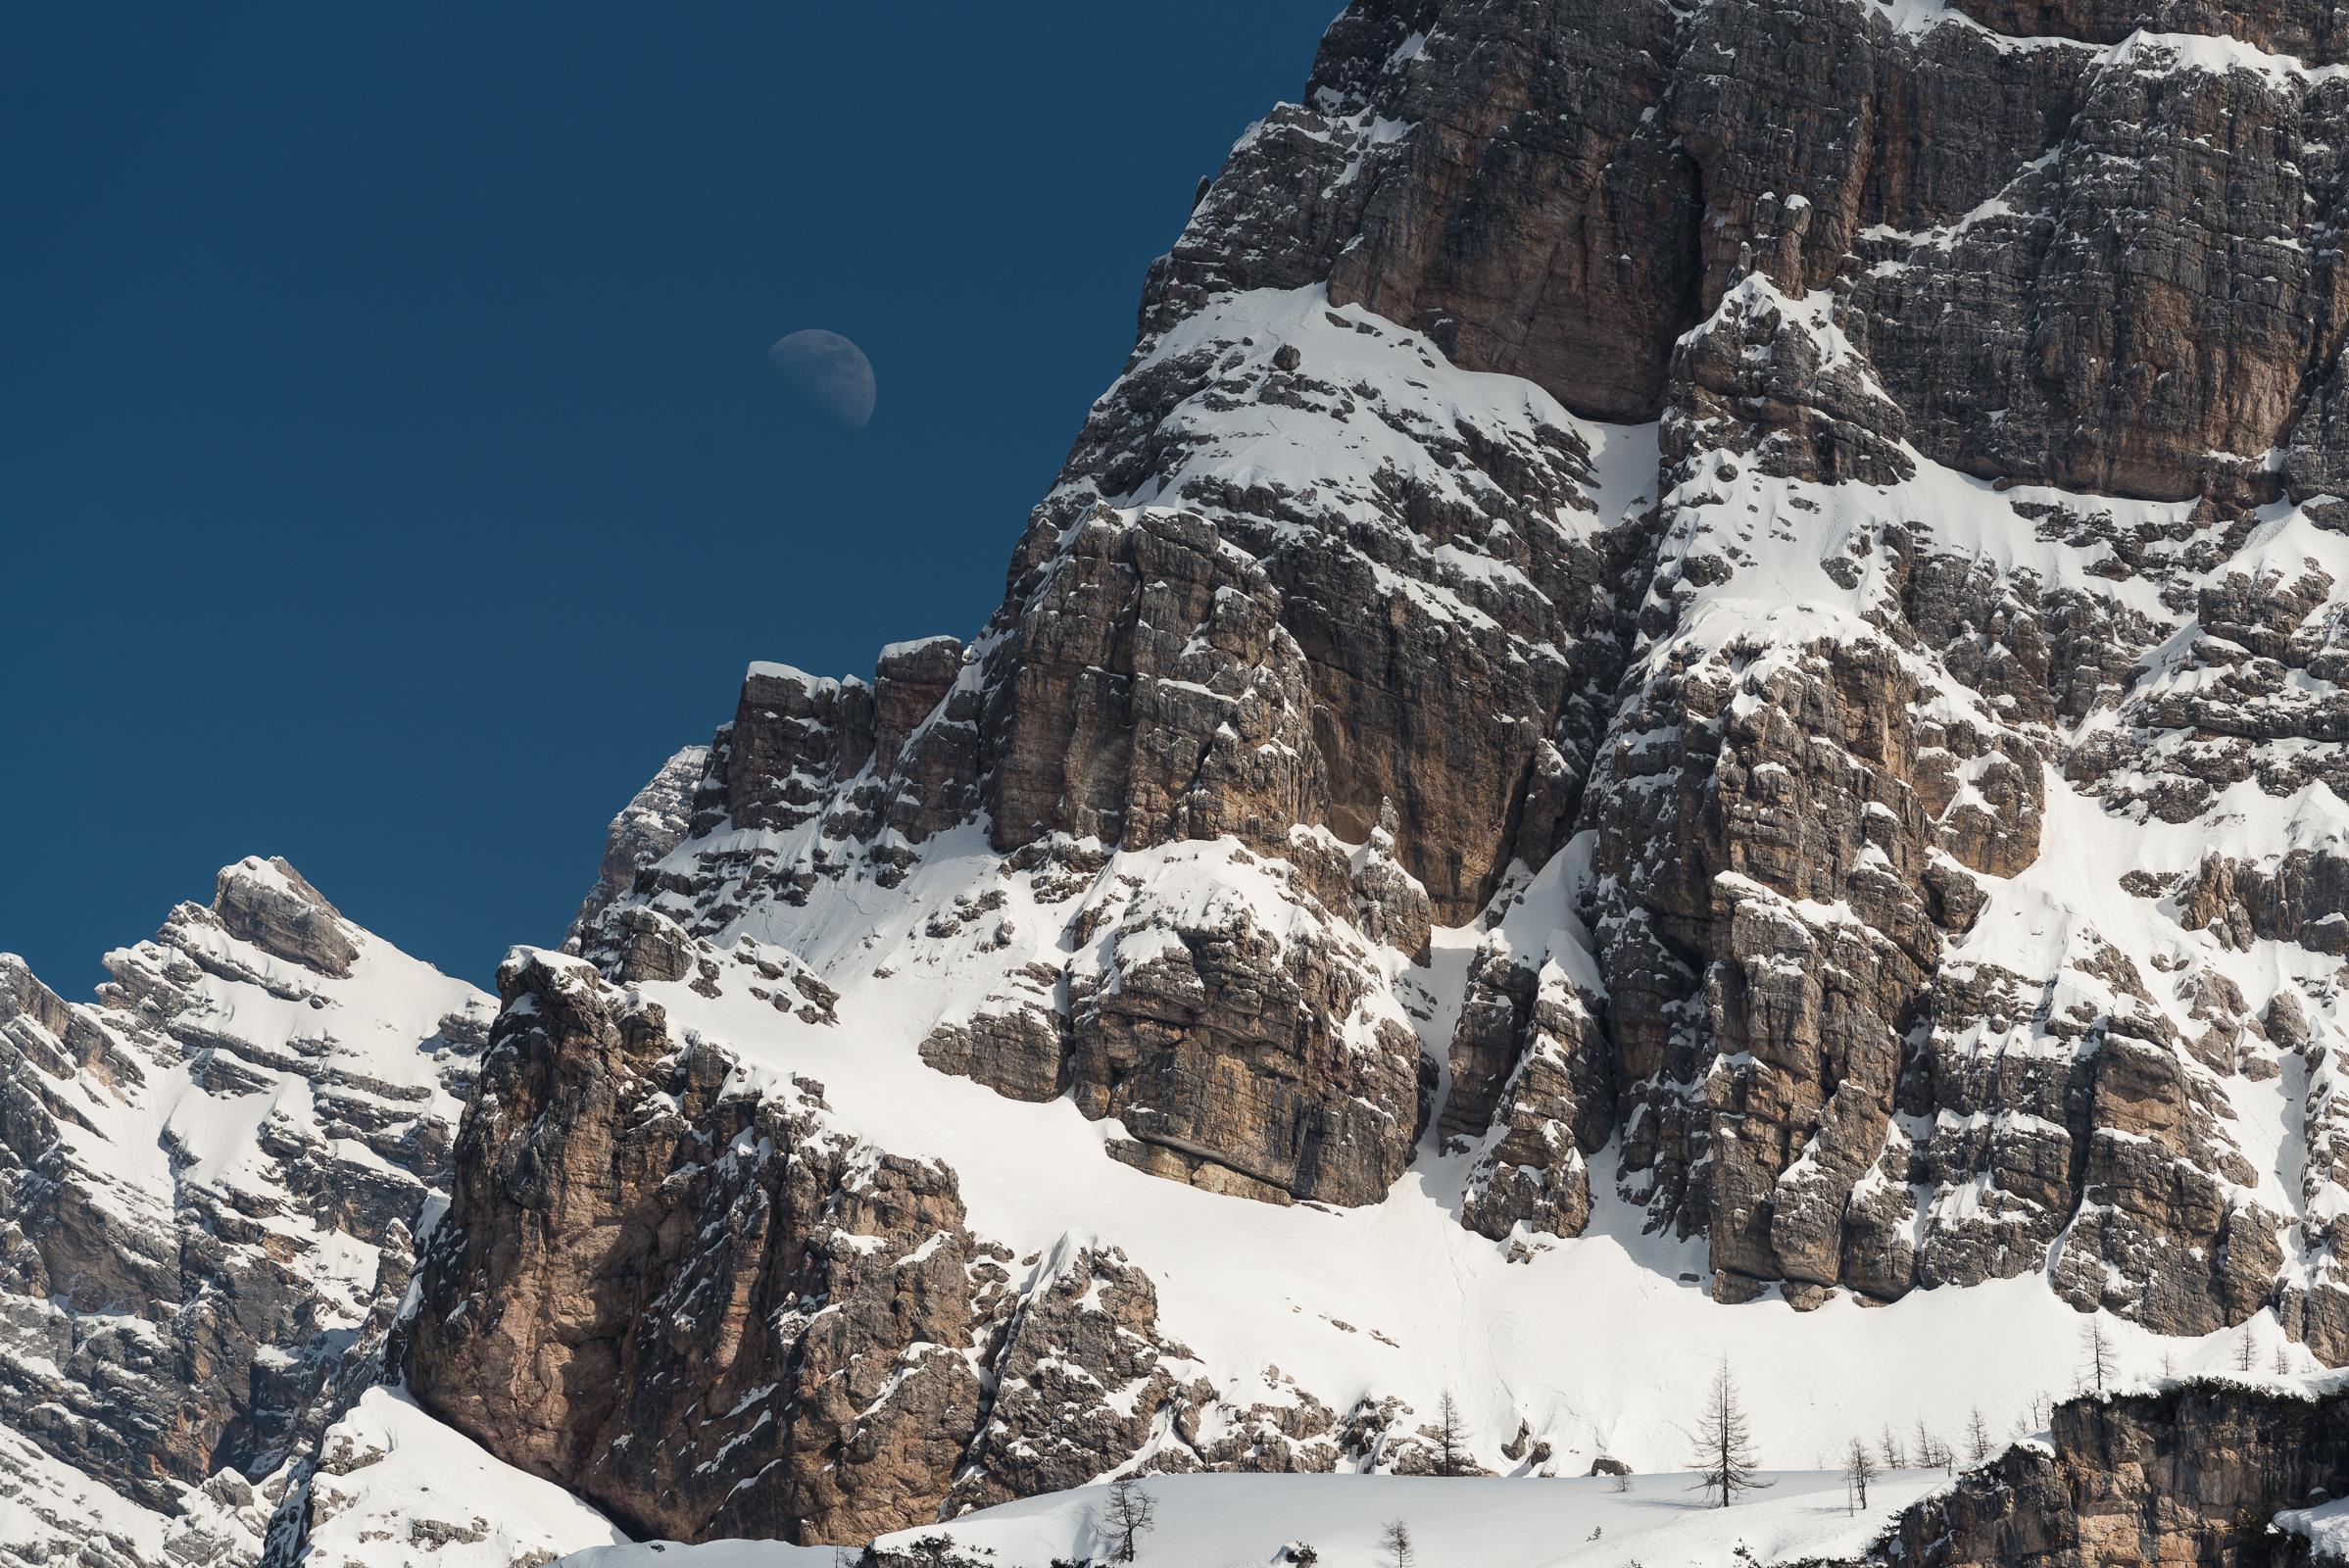 The Moon by day, Monte Pelmo, Dolomiti zoldane (BL)...